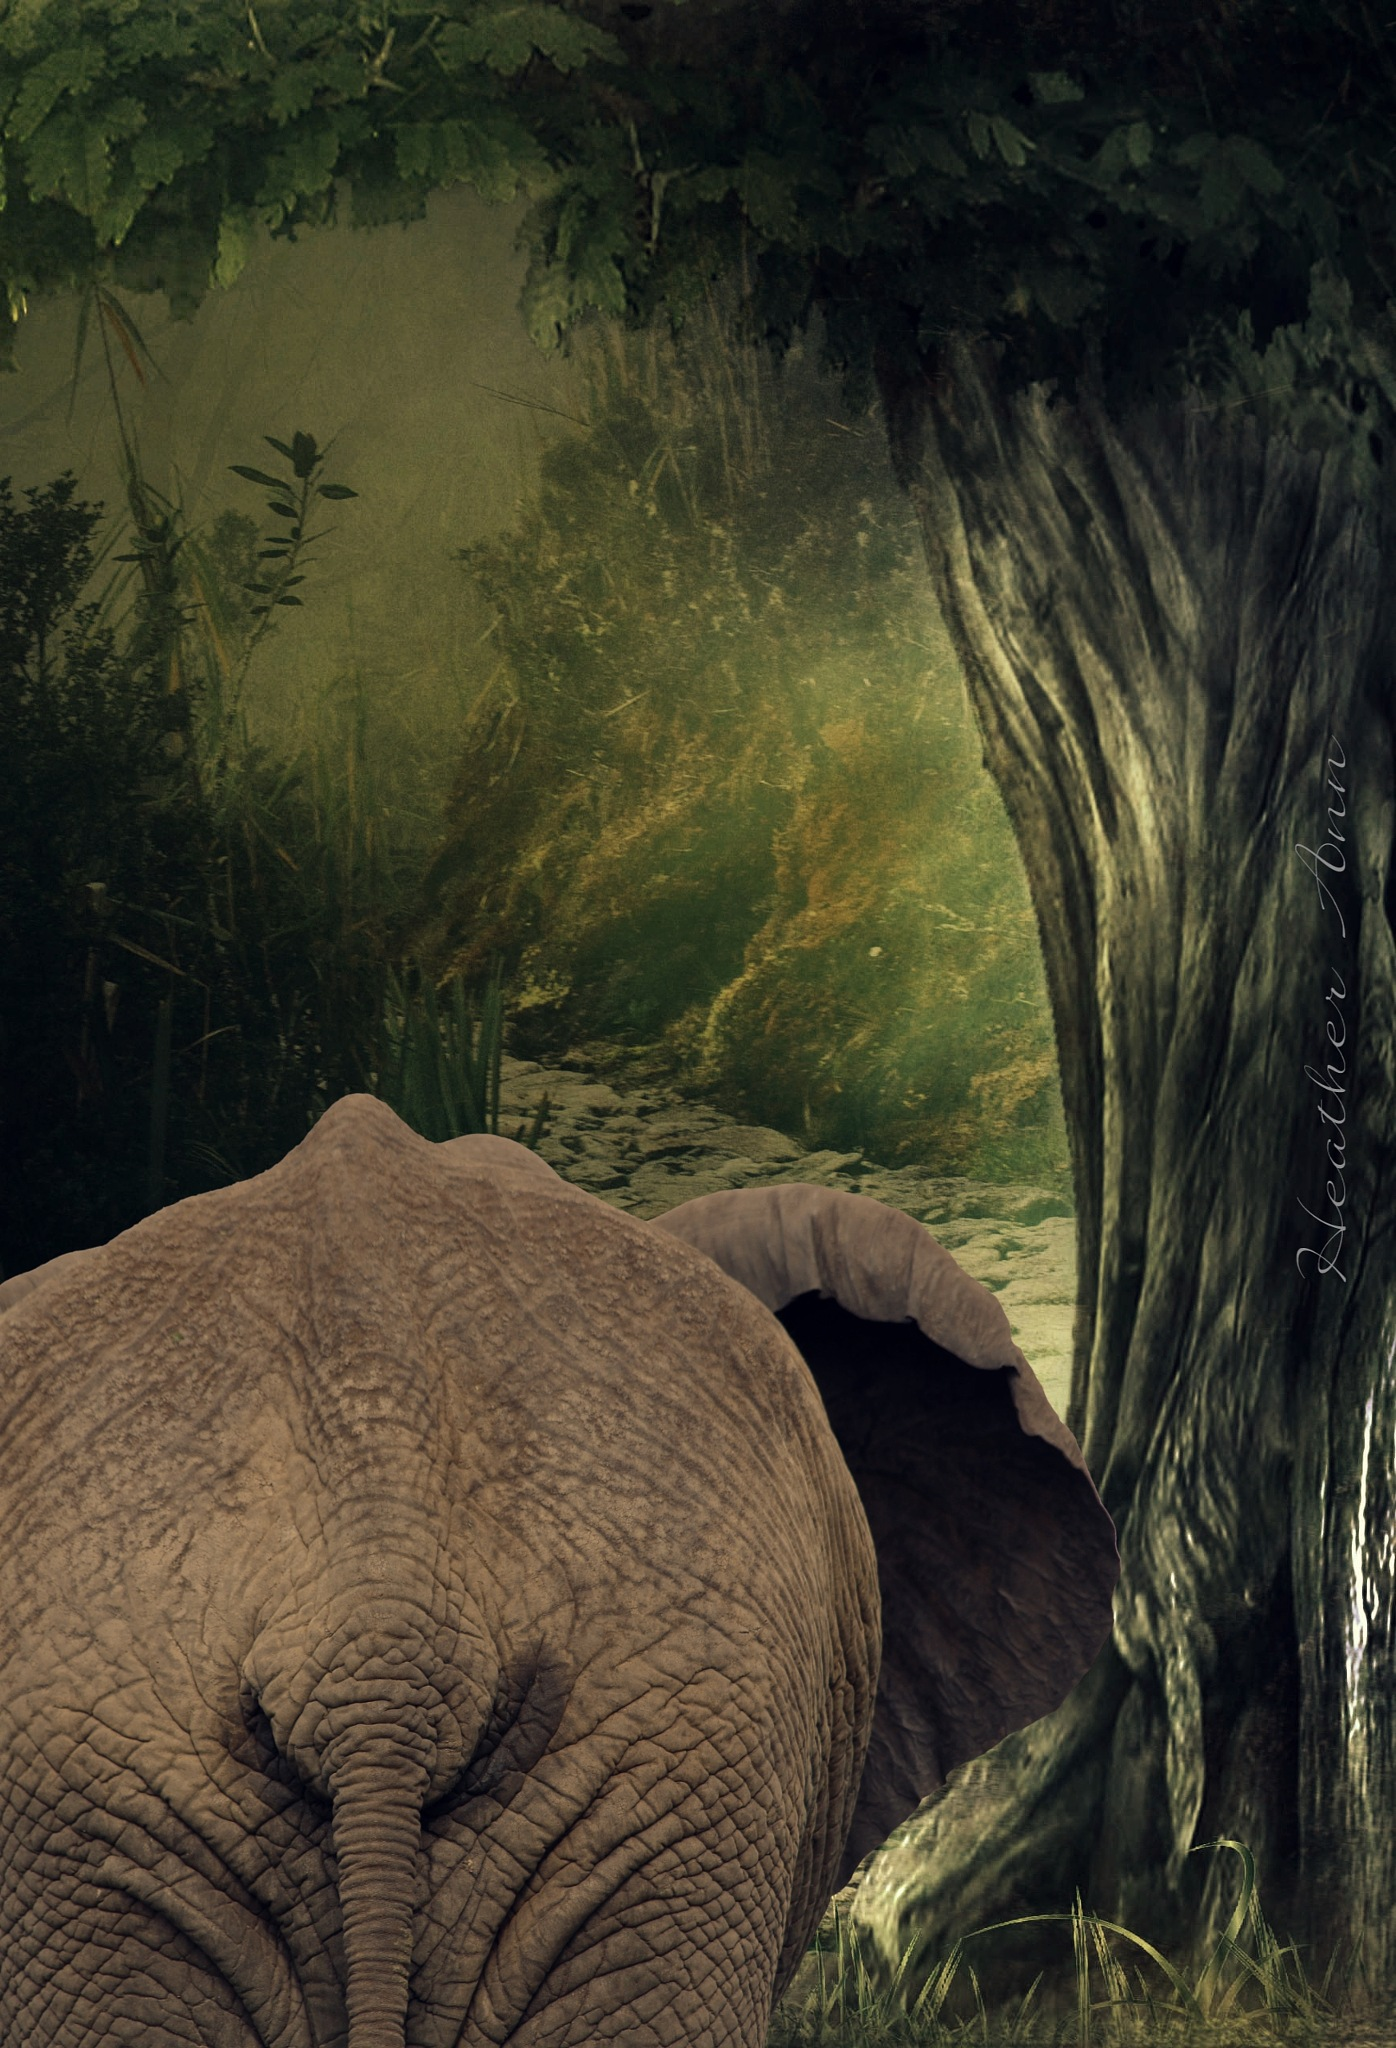 Jungle Book by Heather Ann Plew